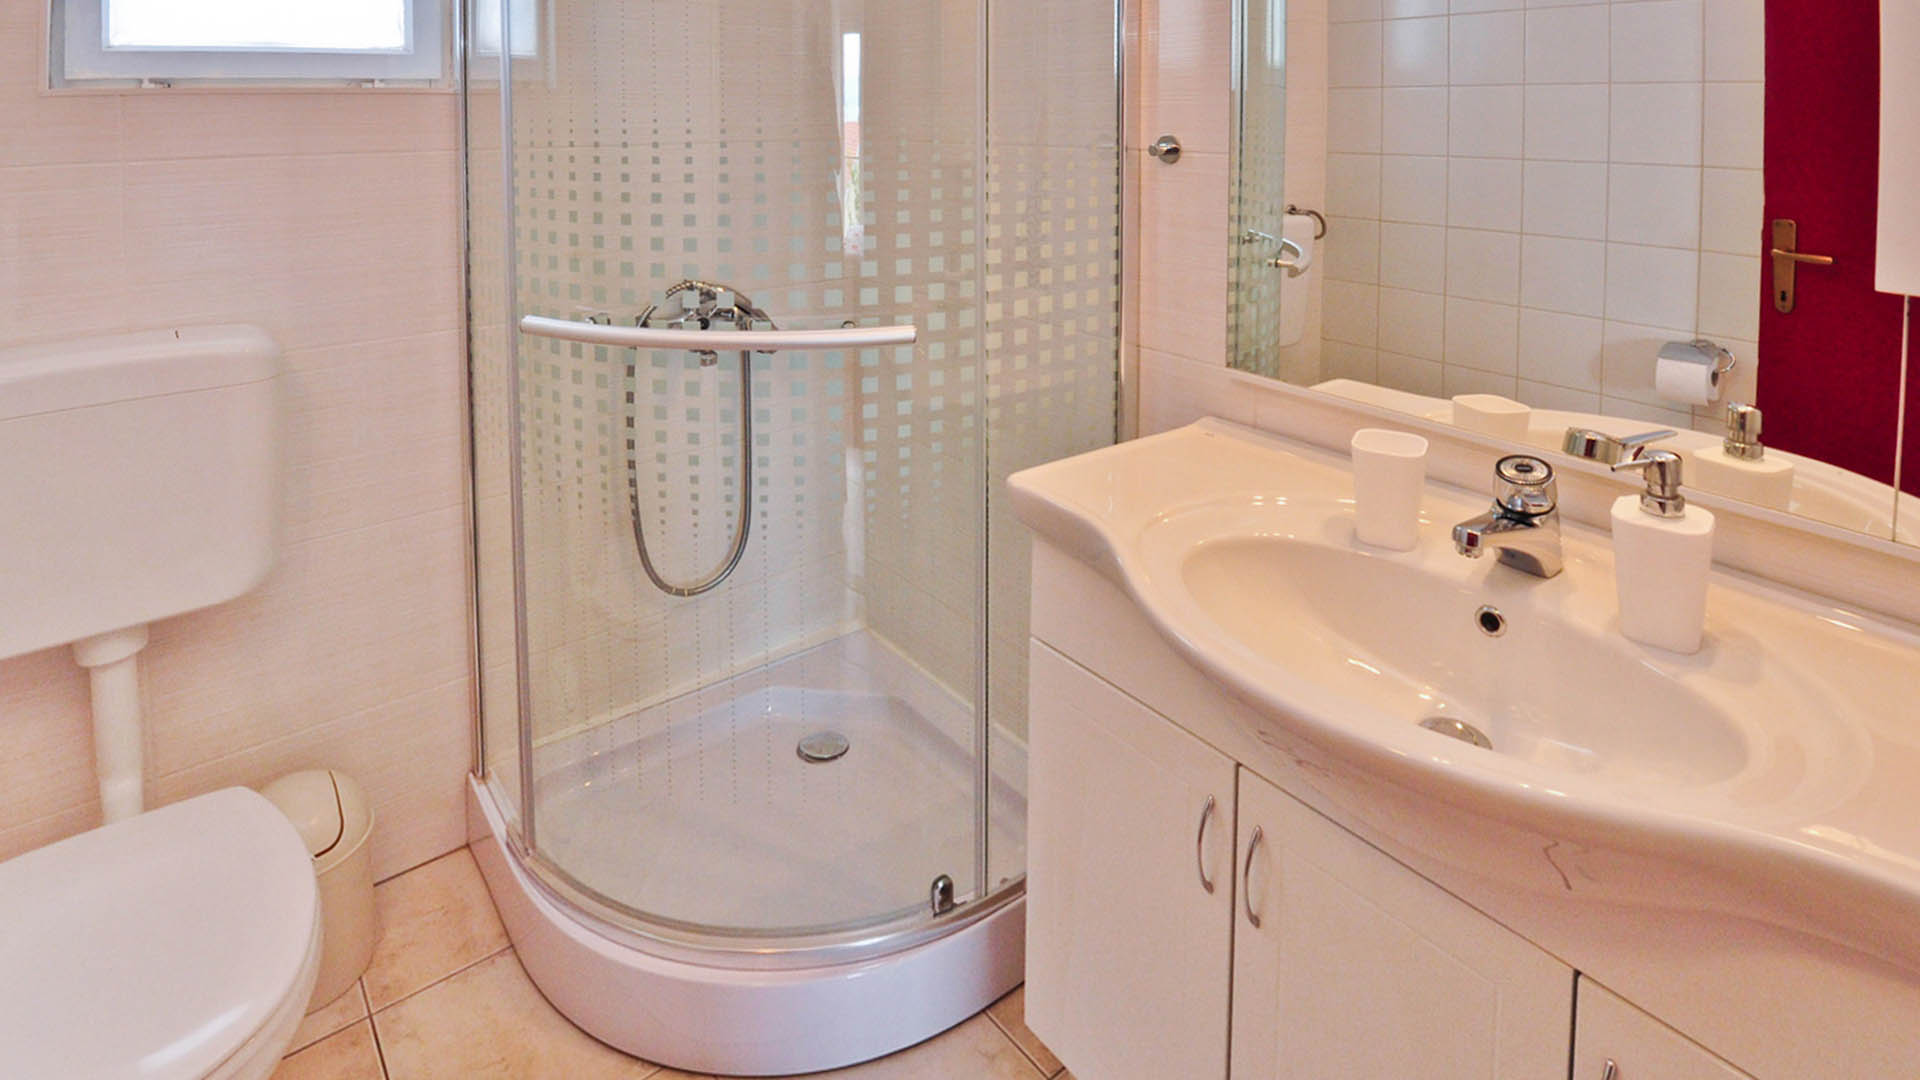 Omiš apartmani zorka deluxe apartman dnevni kupaonica i wc